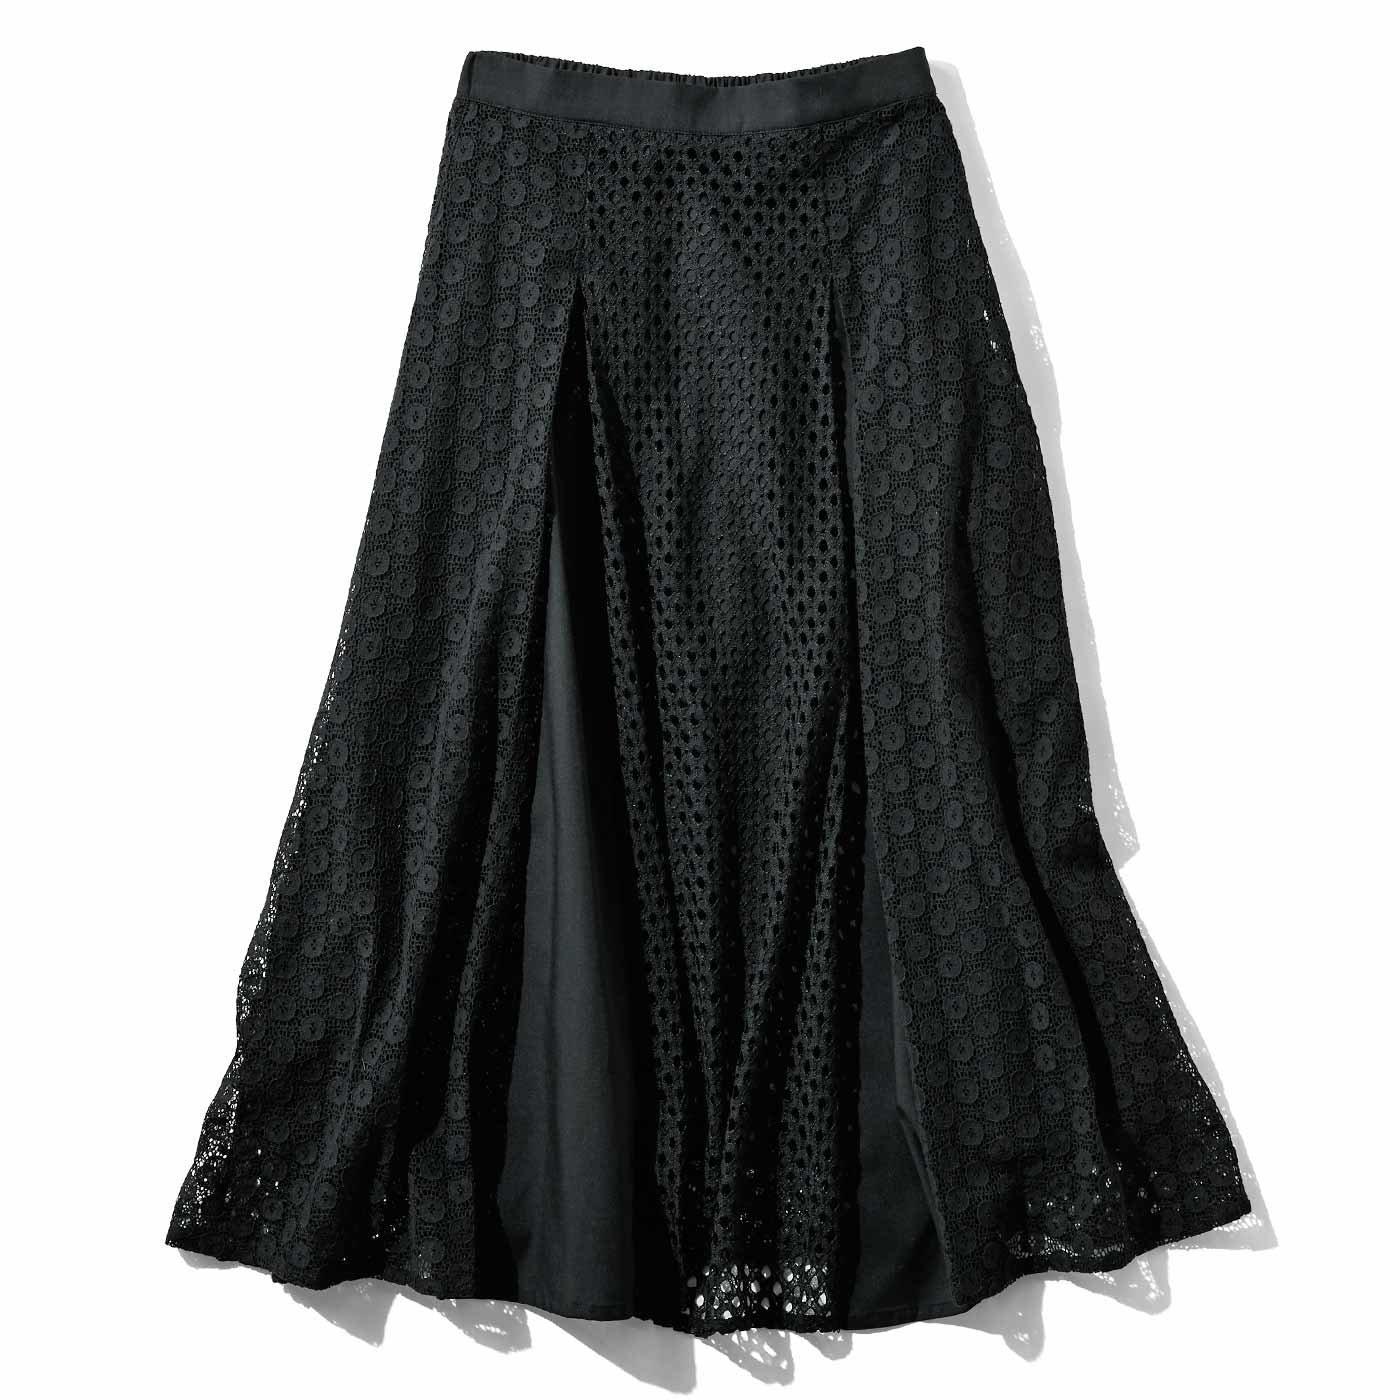 IEDIT[イディット] ぜいたくパネルレースのドラマティックロングスカート〈ブラック〉